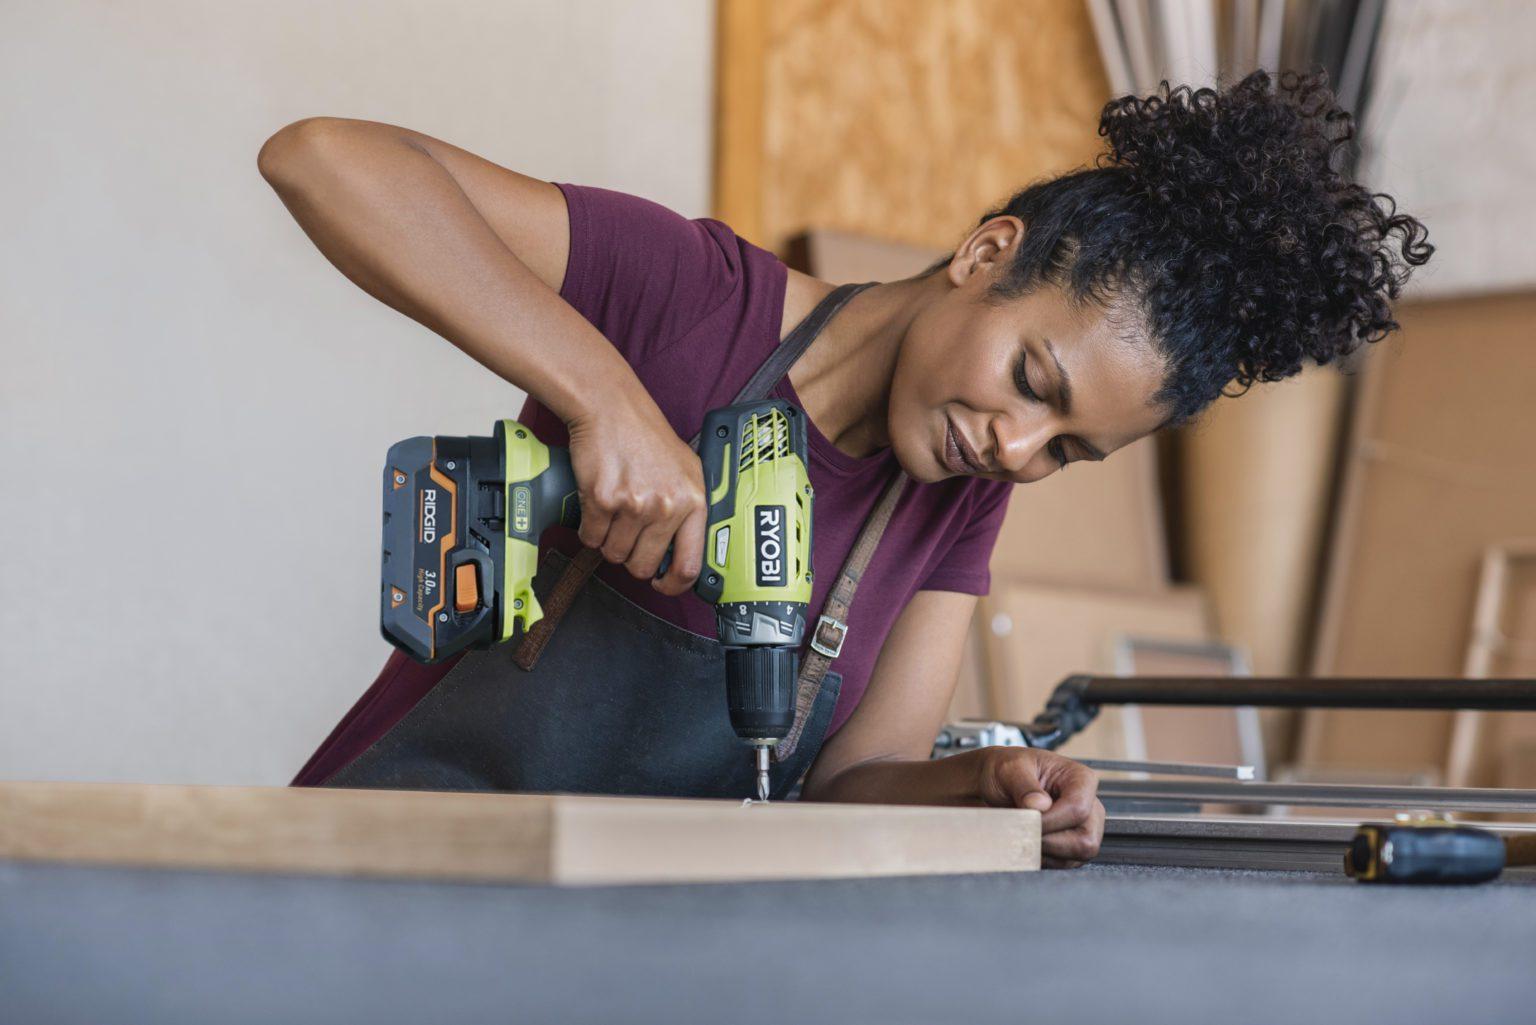 Woman doing DIY with Ryobi drill